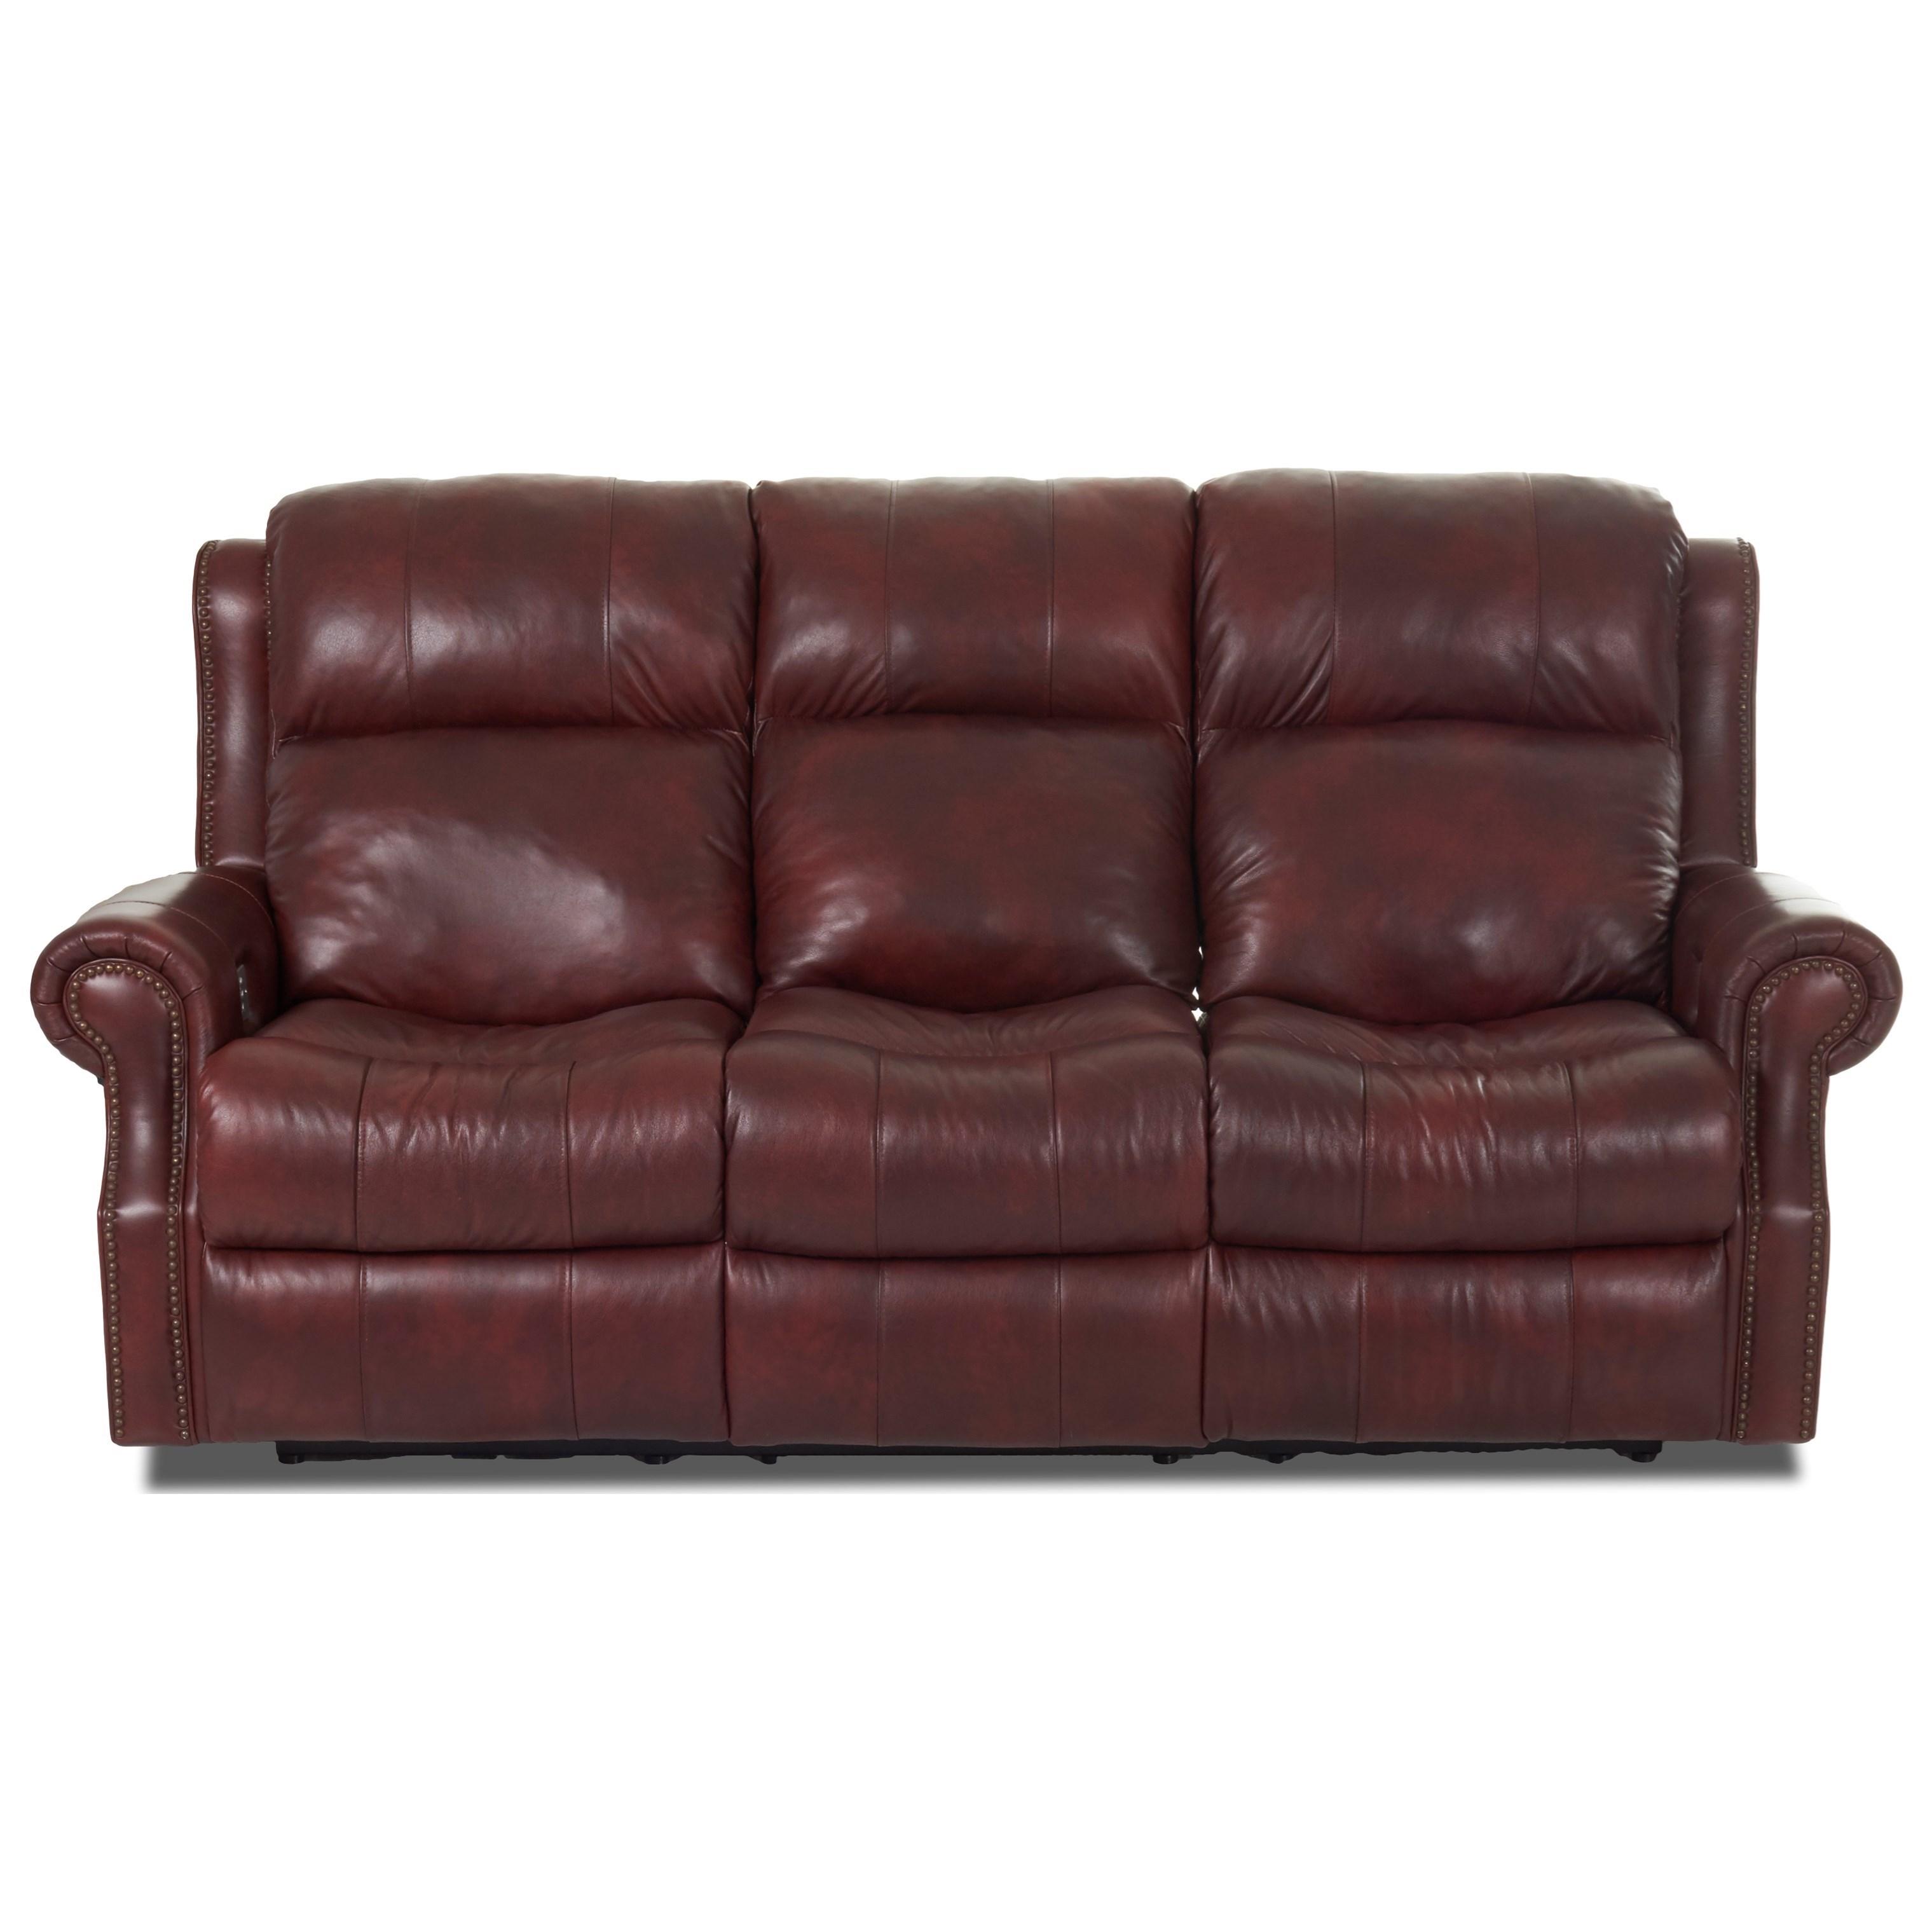 Traditional Reclining Sofa with Nailhead Border